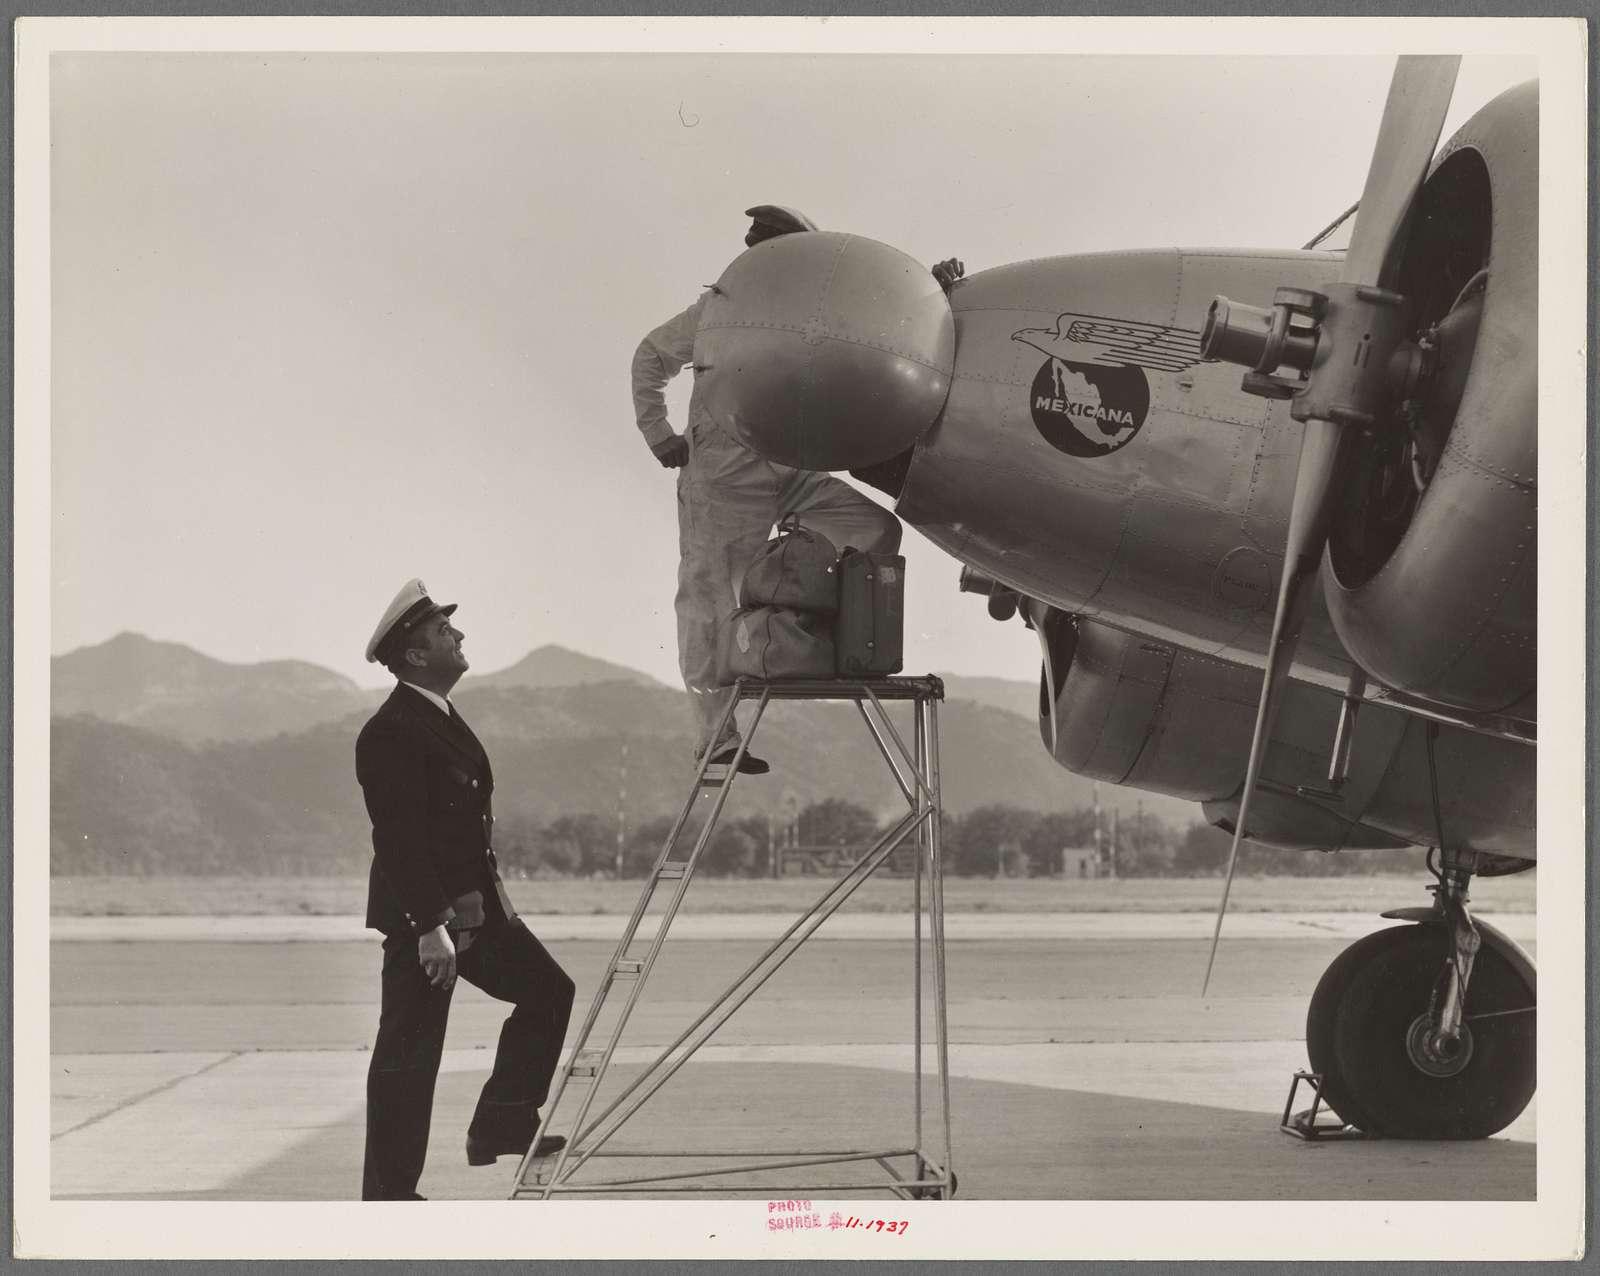 Plant quarantine inspectors examining plane at the Glendale Airport, California